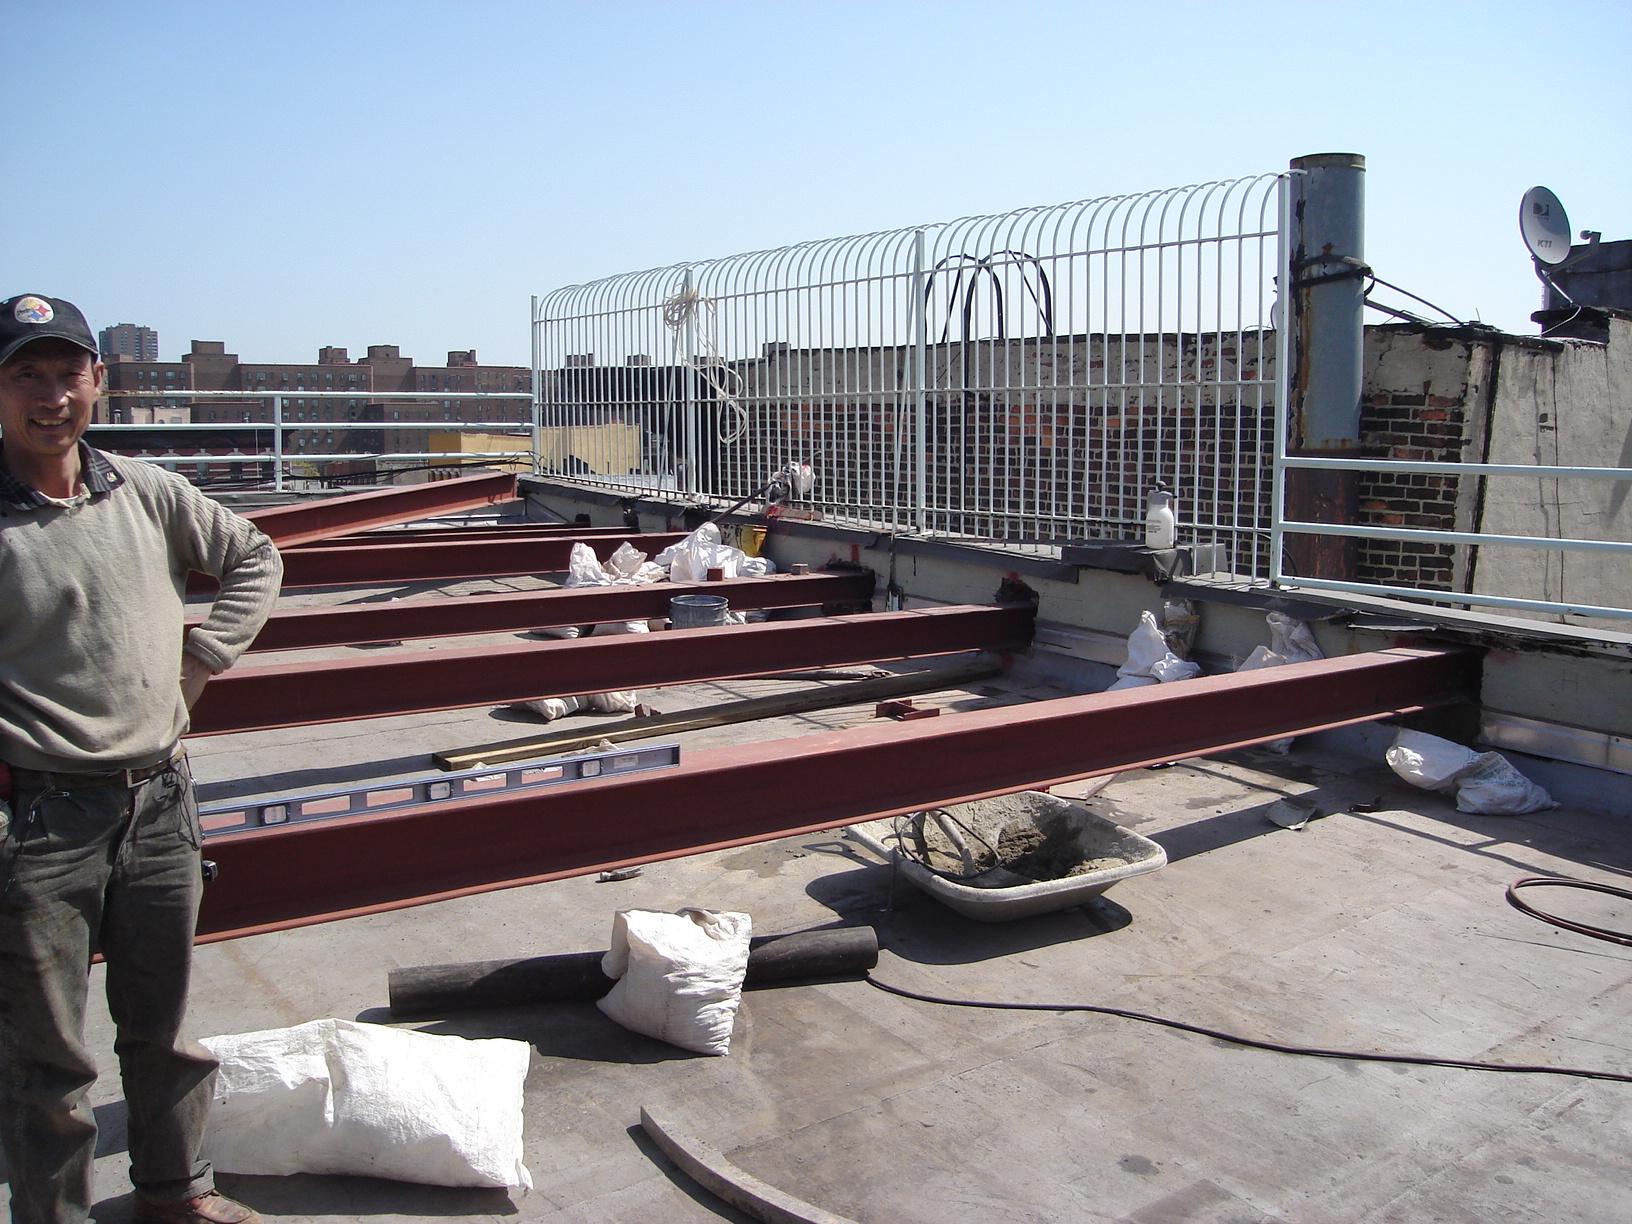 east village roof garden structural steel 04-24-08